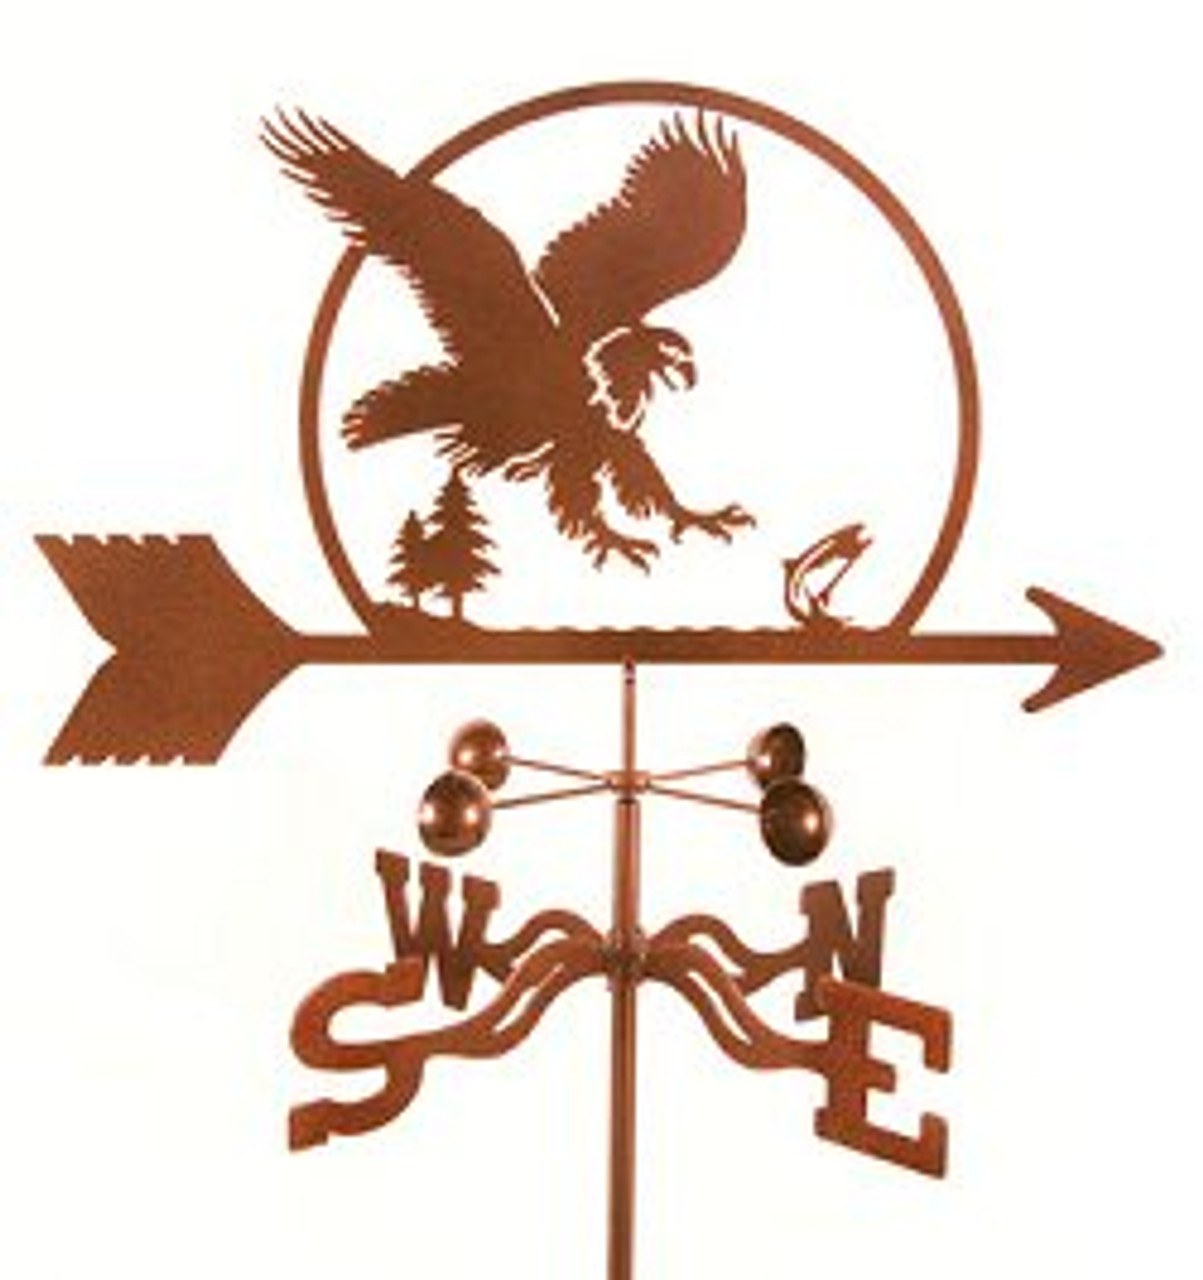 Bird-Eagle Weathervane with mount